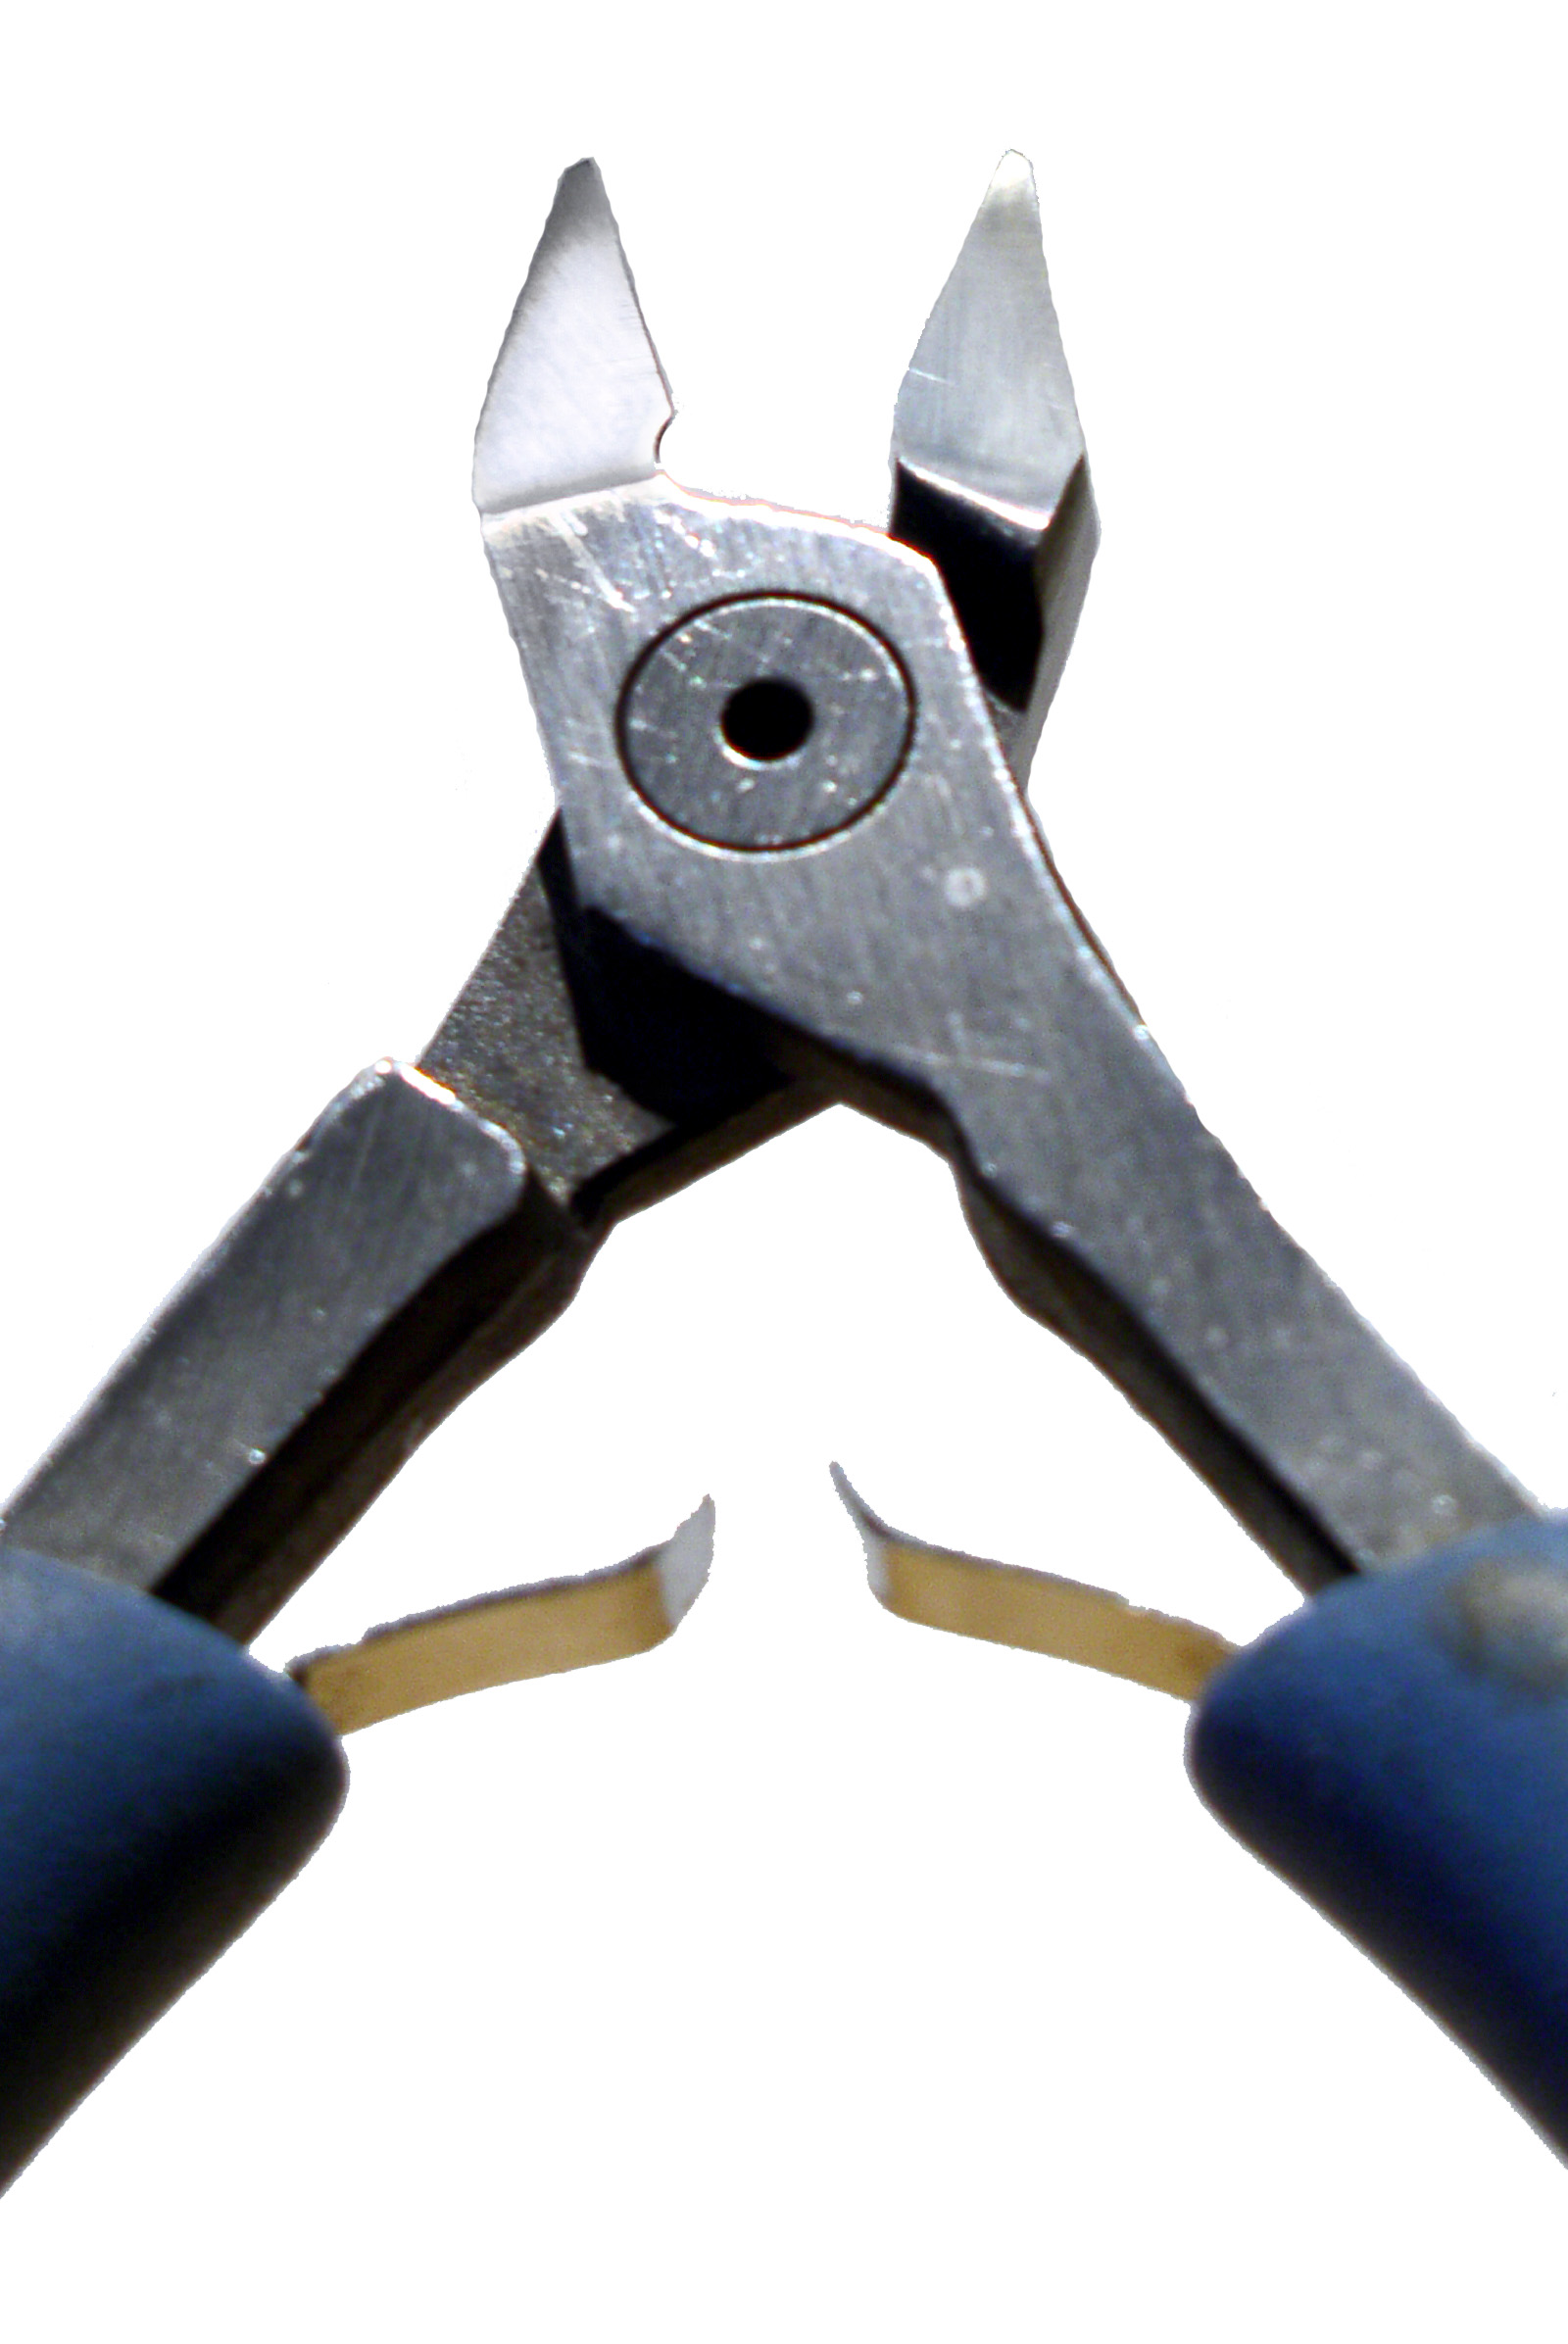 June Tech U0026 39 S Files  Essential Tools